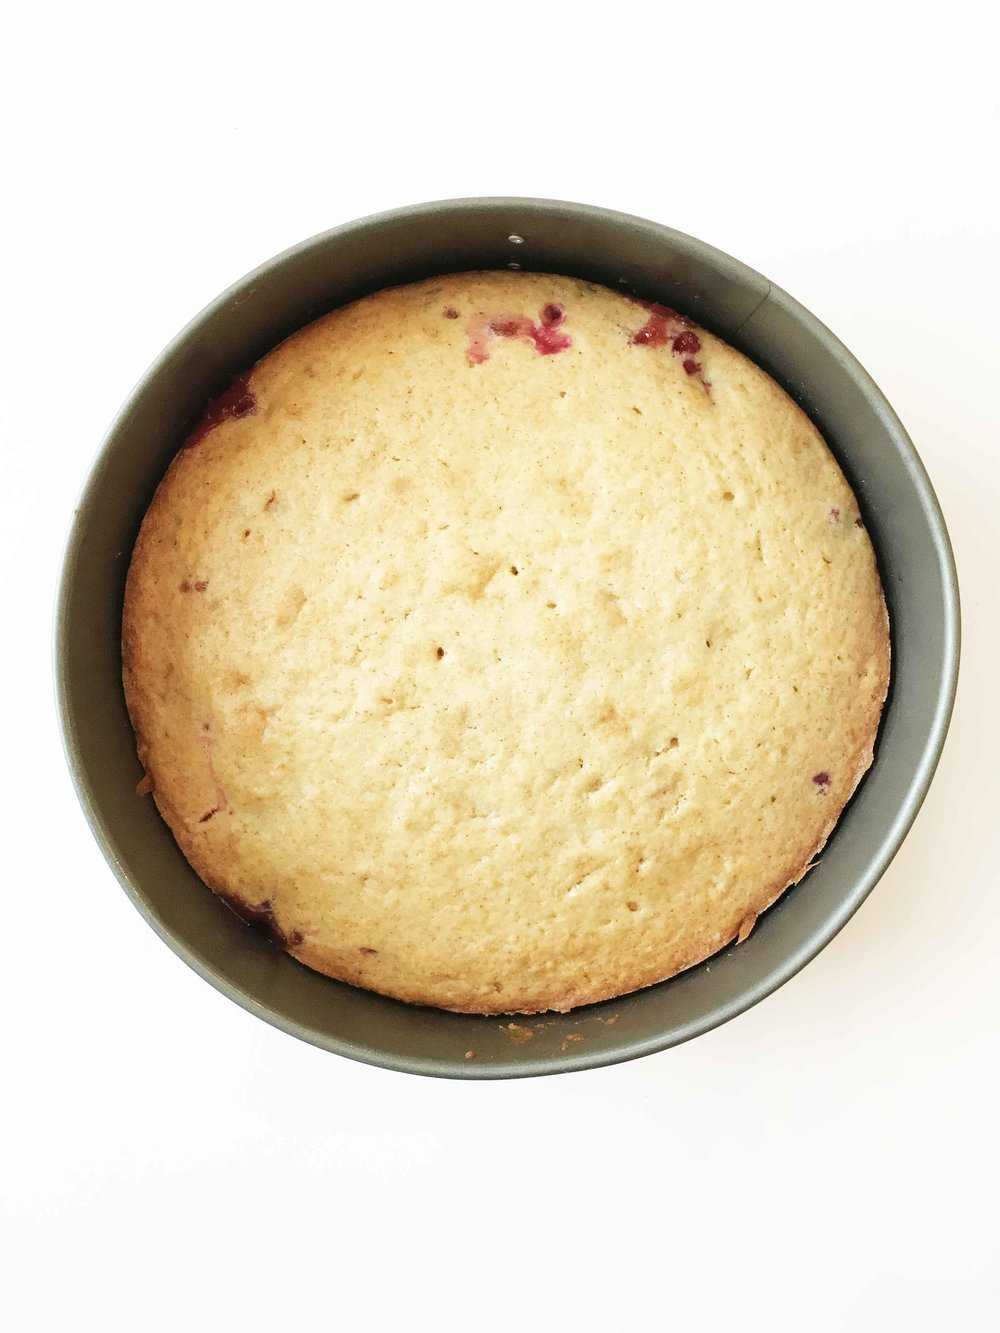 cranberry-upside-down-cake14.jpg